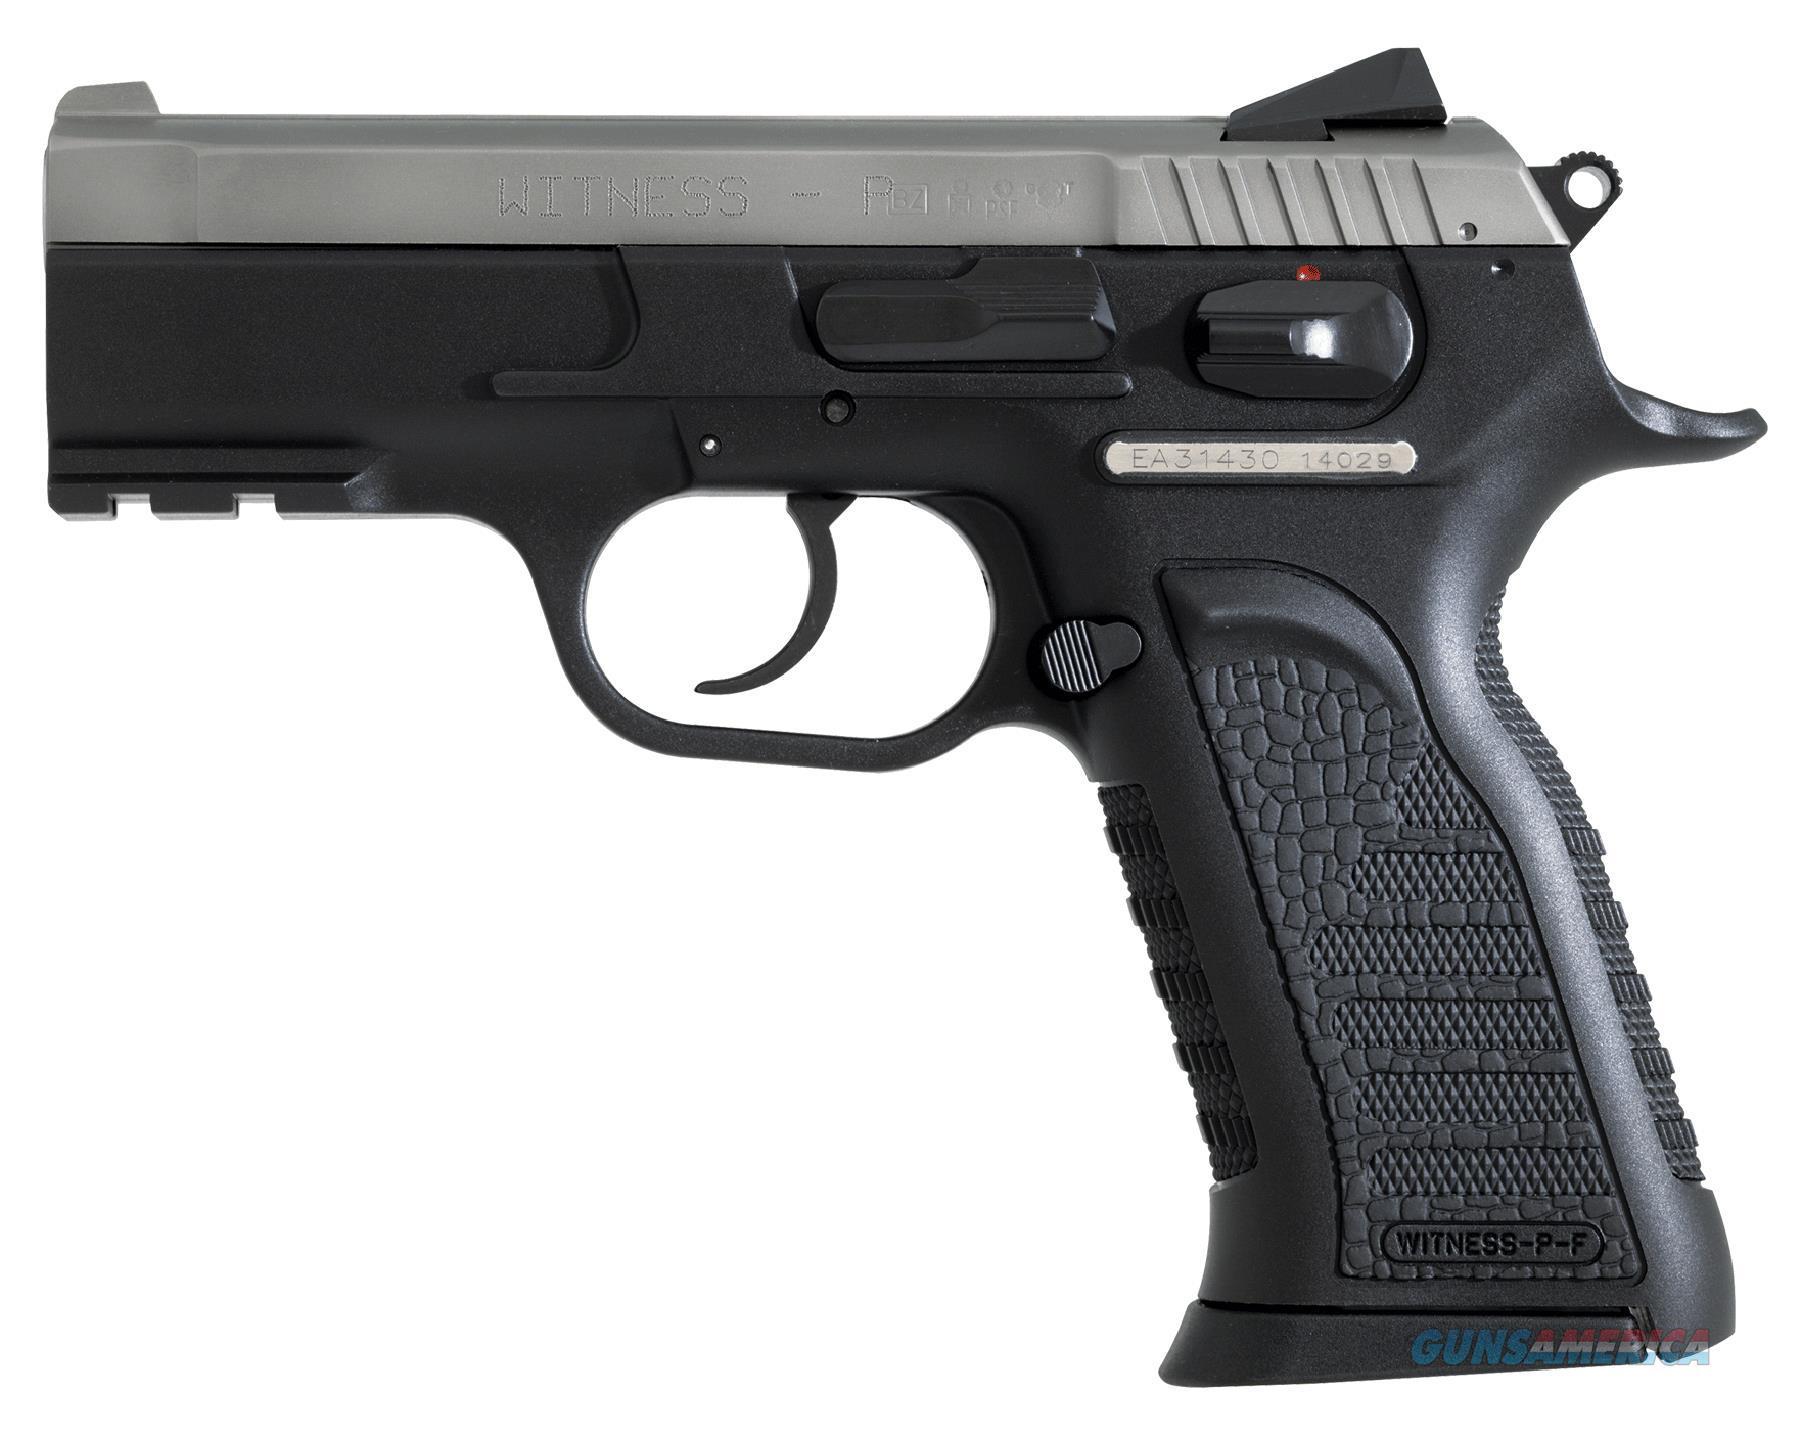 "Eaa 600247 Witness Polymer Carry Da/Sa 40S&W 3.6"" 14+1 Blk Syn Grip Ss 600247  Guns > Pistols > E Misc Pistols"